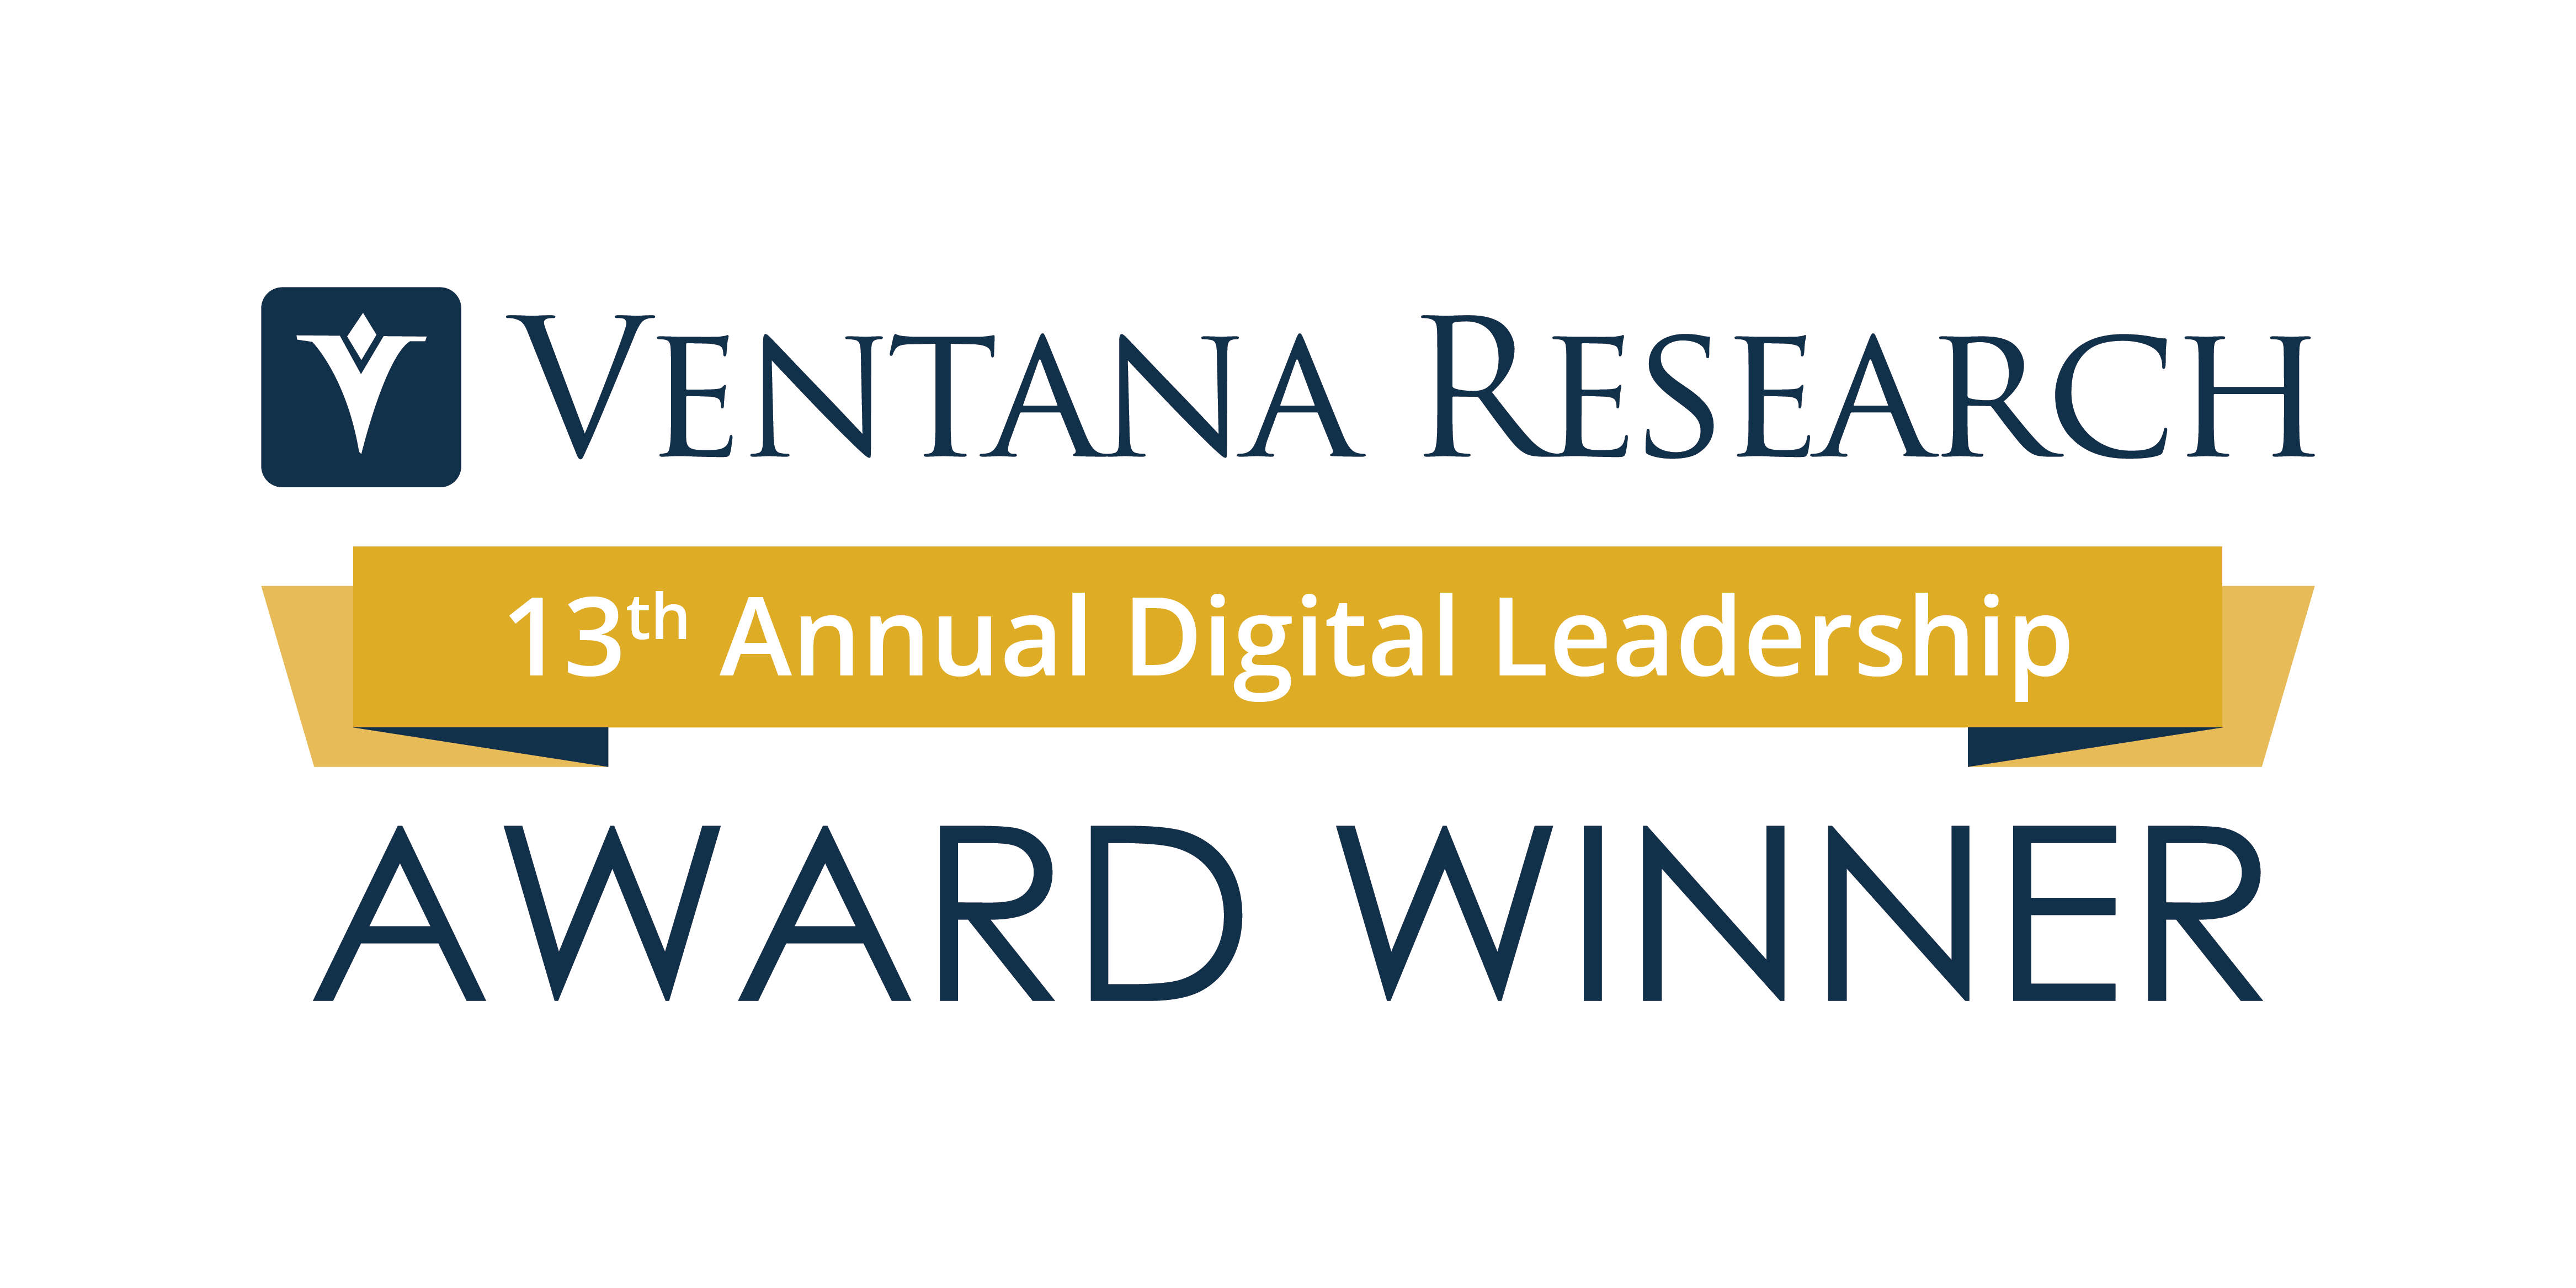 VentanaResearch_13th_Annual_Digital_LeadershipAwards_Winner